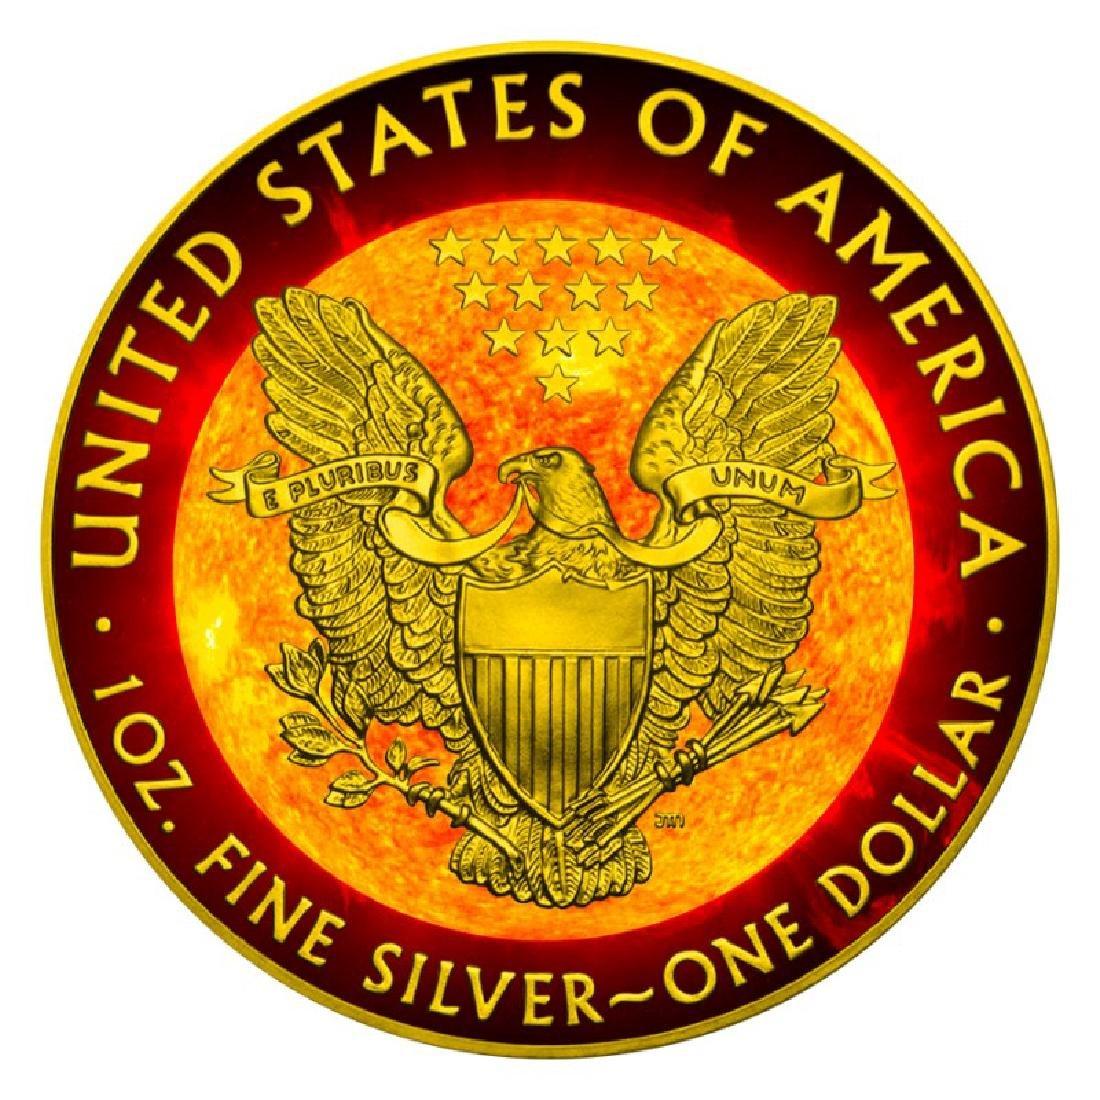 2016 Walking Liberty Solar Flare Silver Eagle Coin - 2